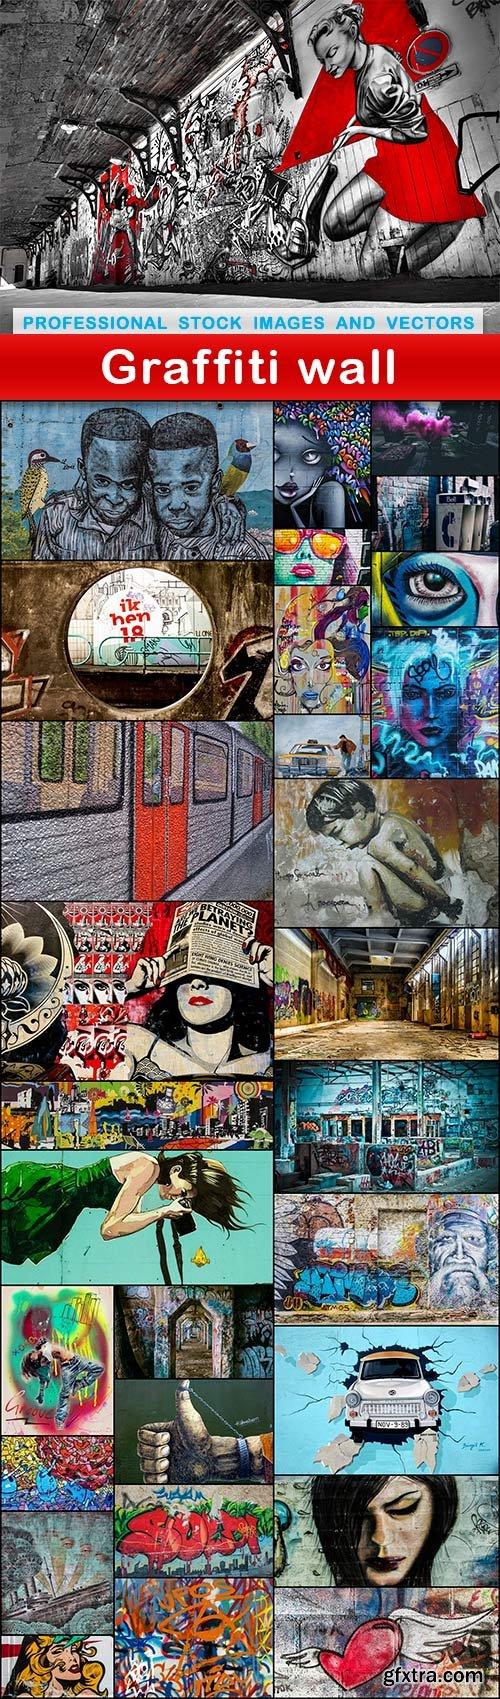 Graffiti wall - 30 UHQ JPEG